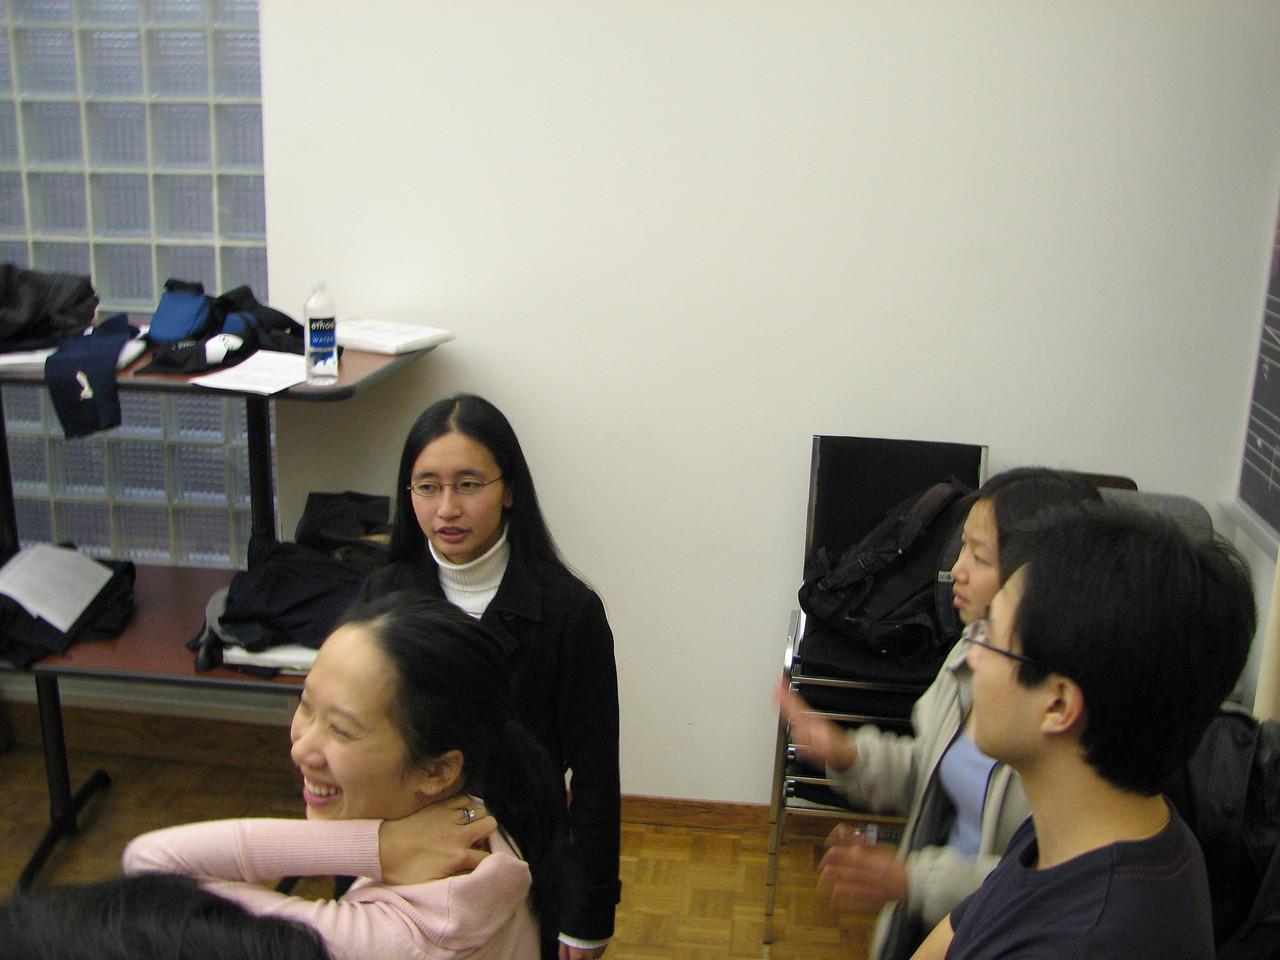 2006 12 02 Sat - Sandra Huang, Tina Wong, Jenny Alyono, & Sanghyup Kwak 1